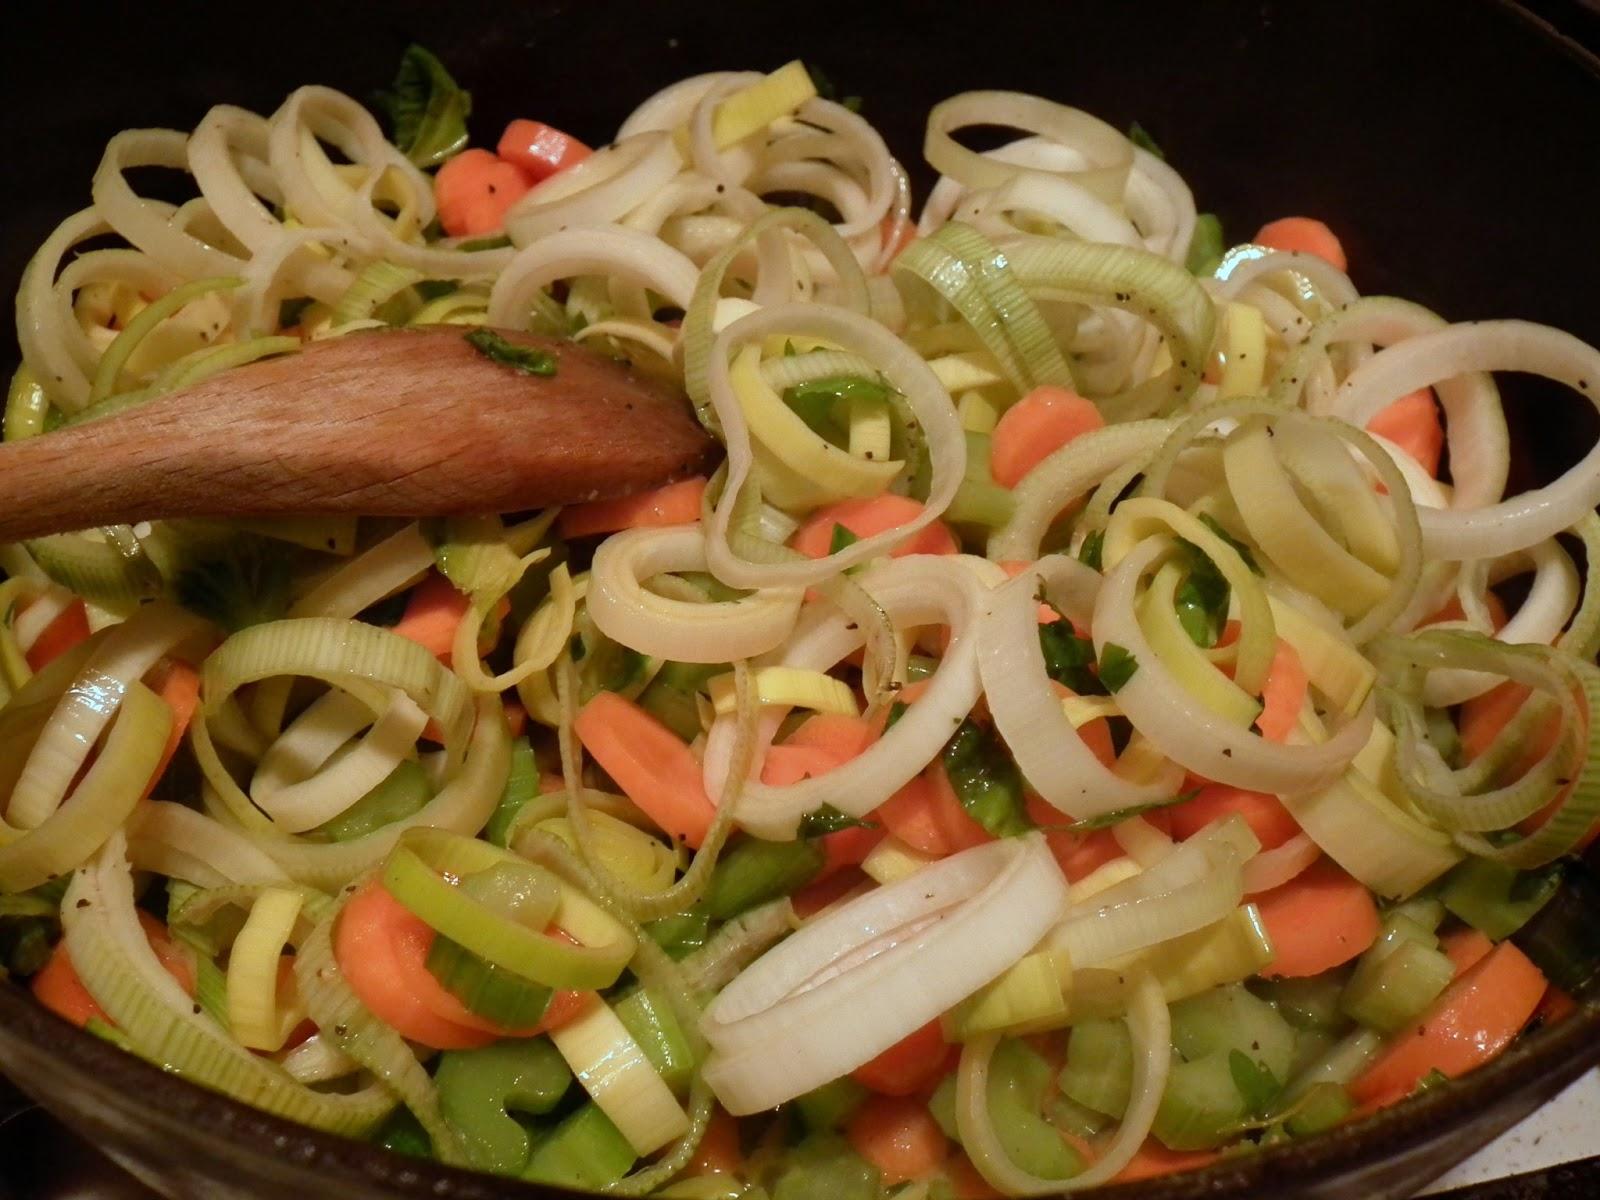 Grill Boneless Pork Chops Porkchops Pork Chops Chef Jeff Tiedeman 2 Hungry  Hearts: It Was